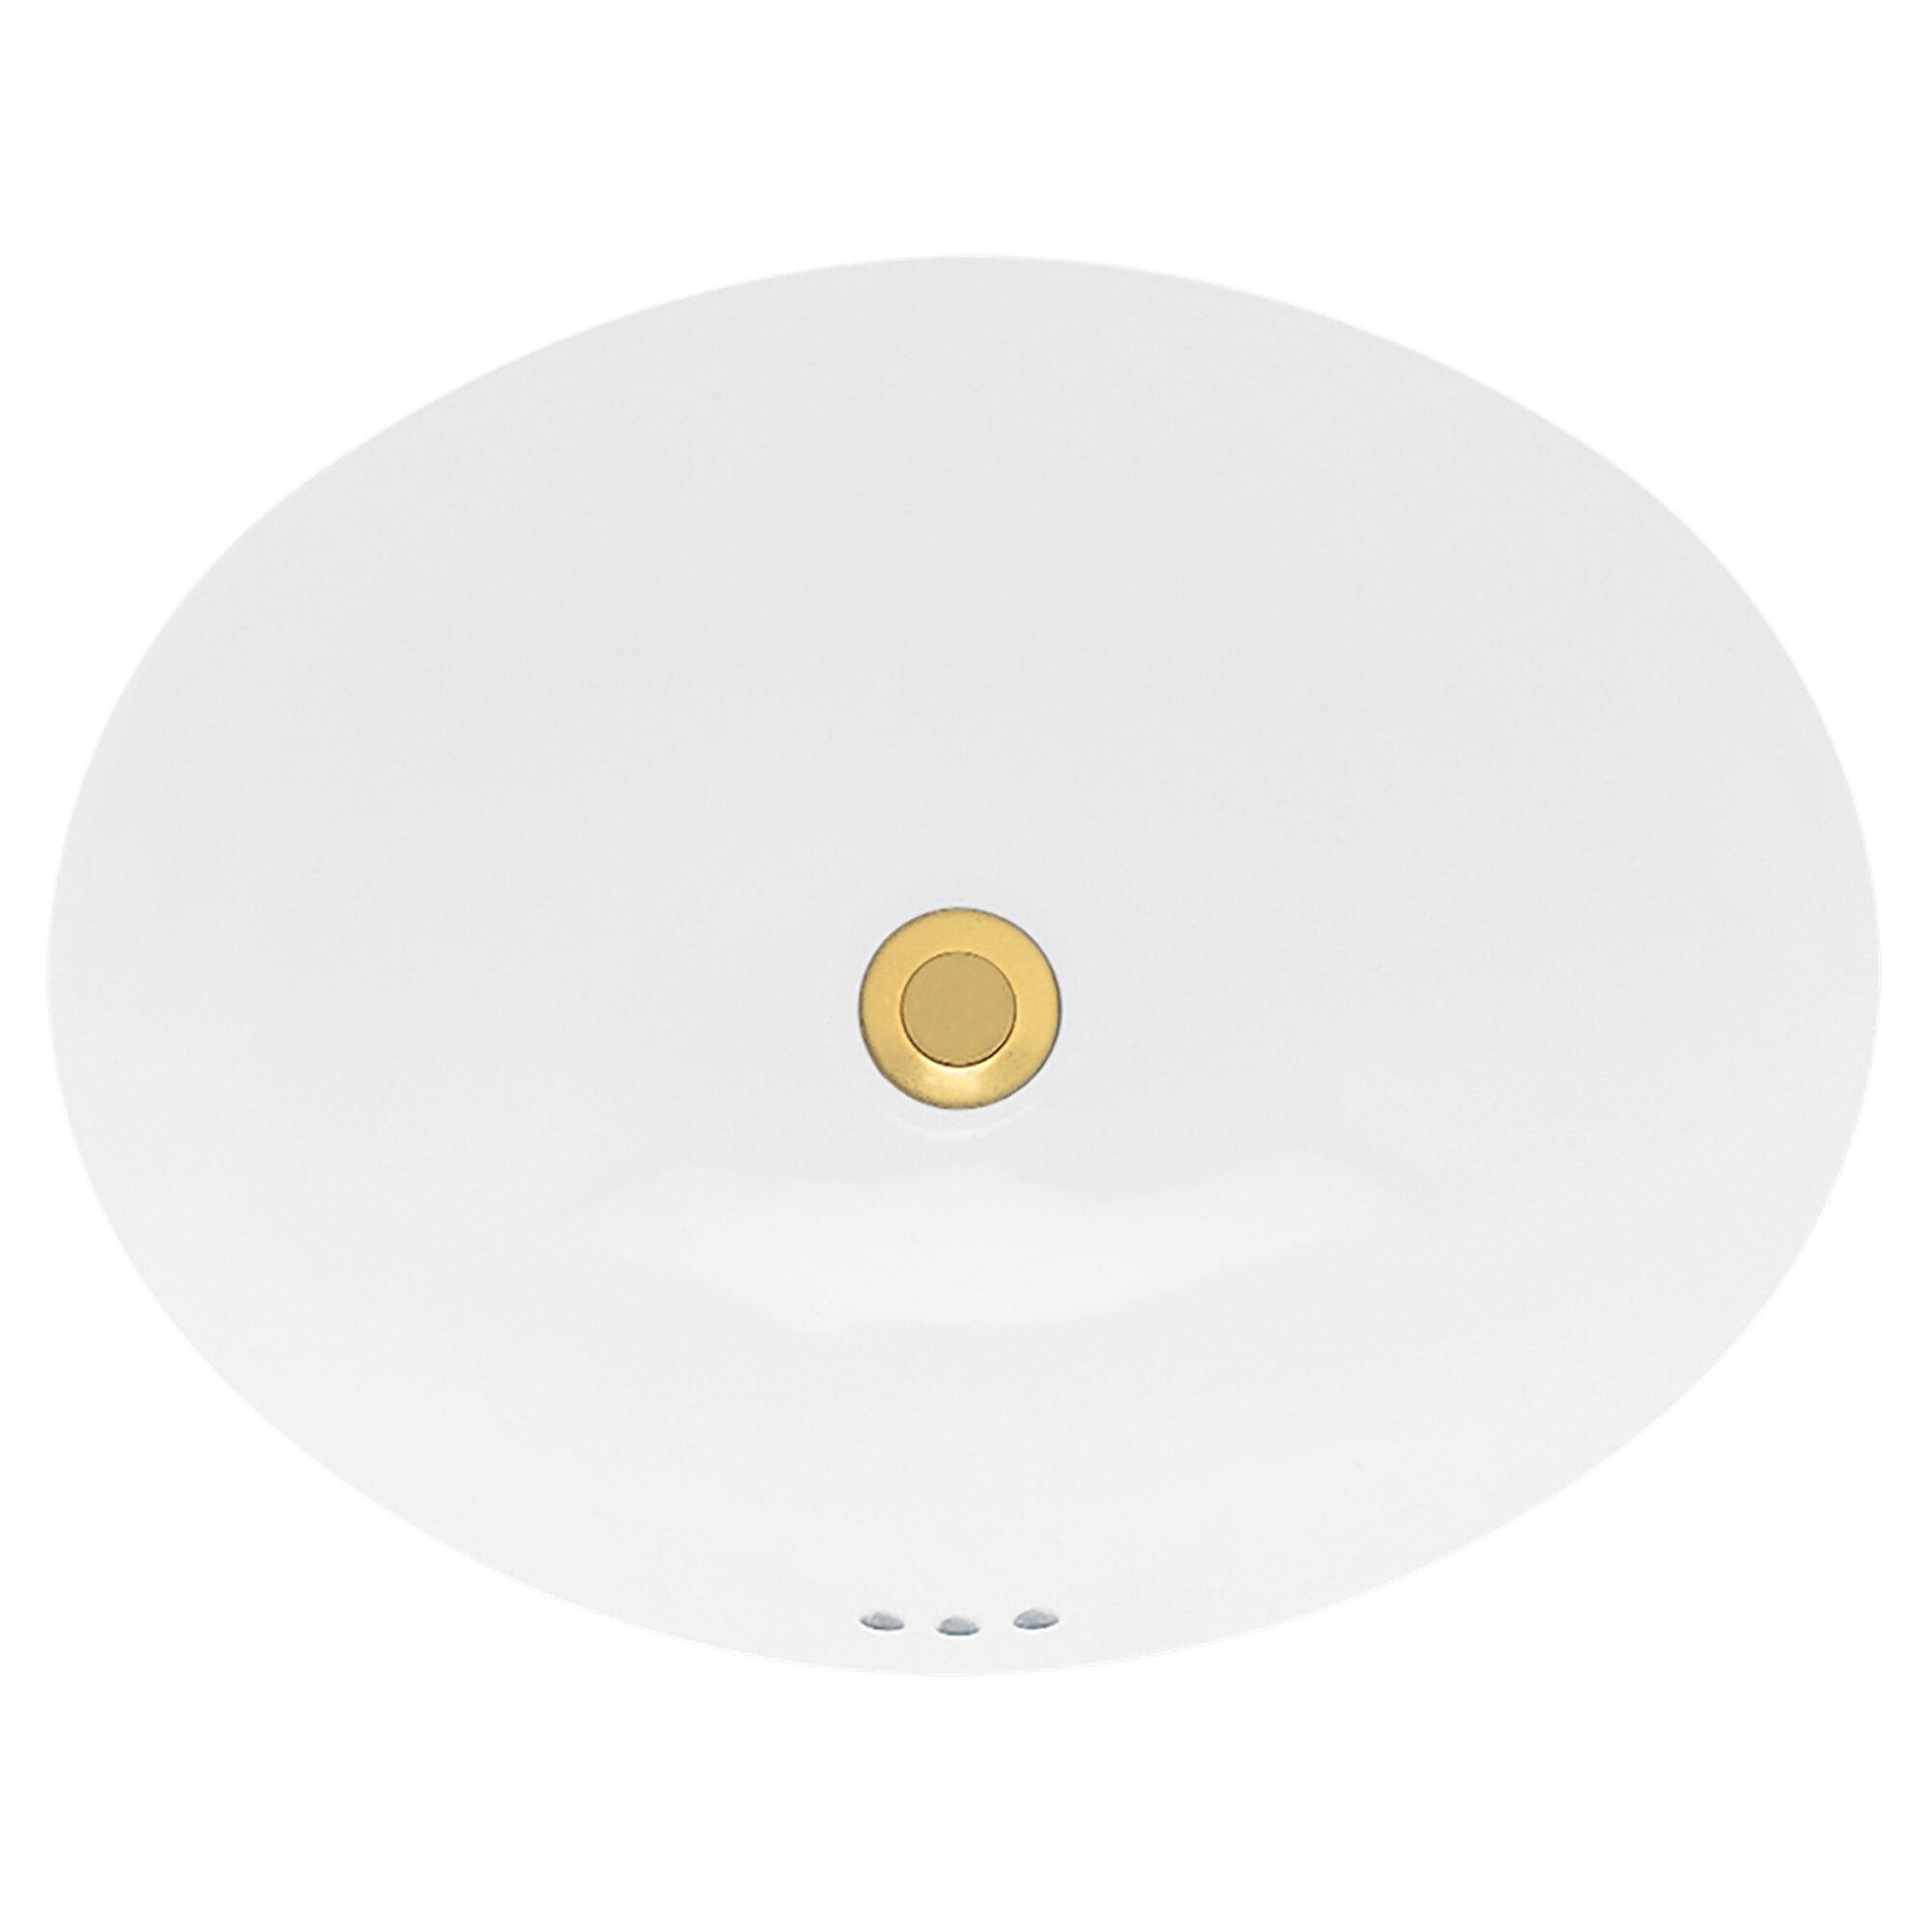 American Standard Ovalyn Bone Vitreous China Oval Undermount Bathroom Sink With Overflow Reviews Wayfair